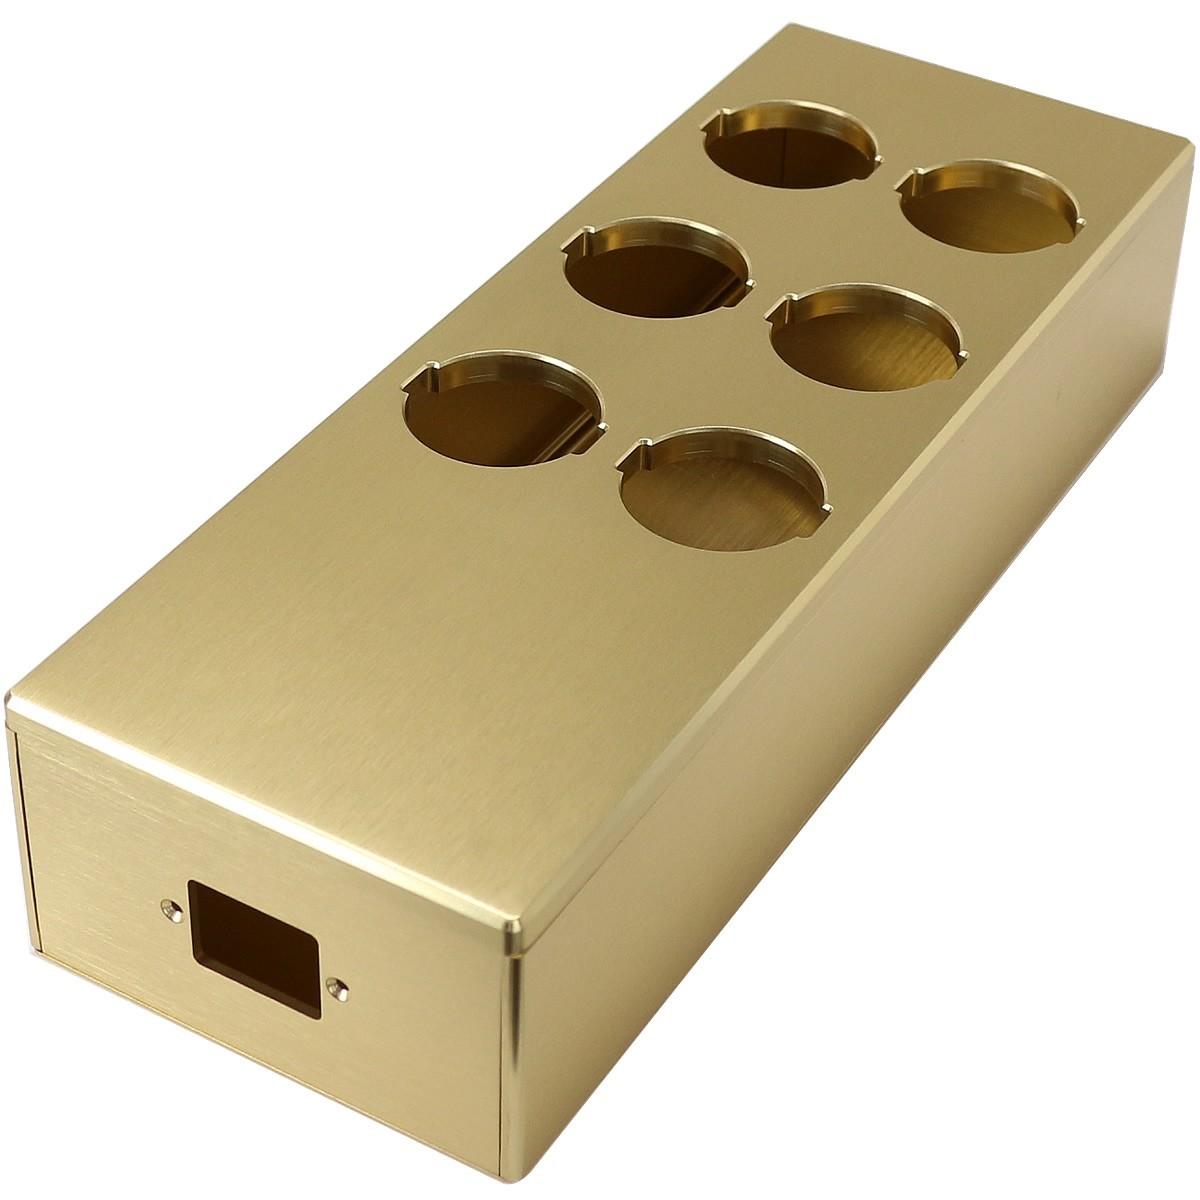 AUDIOPHONICS MPC6 V2 GOLD Aluminum Distributor bare 6 sockets location